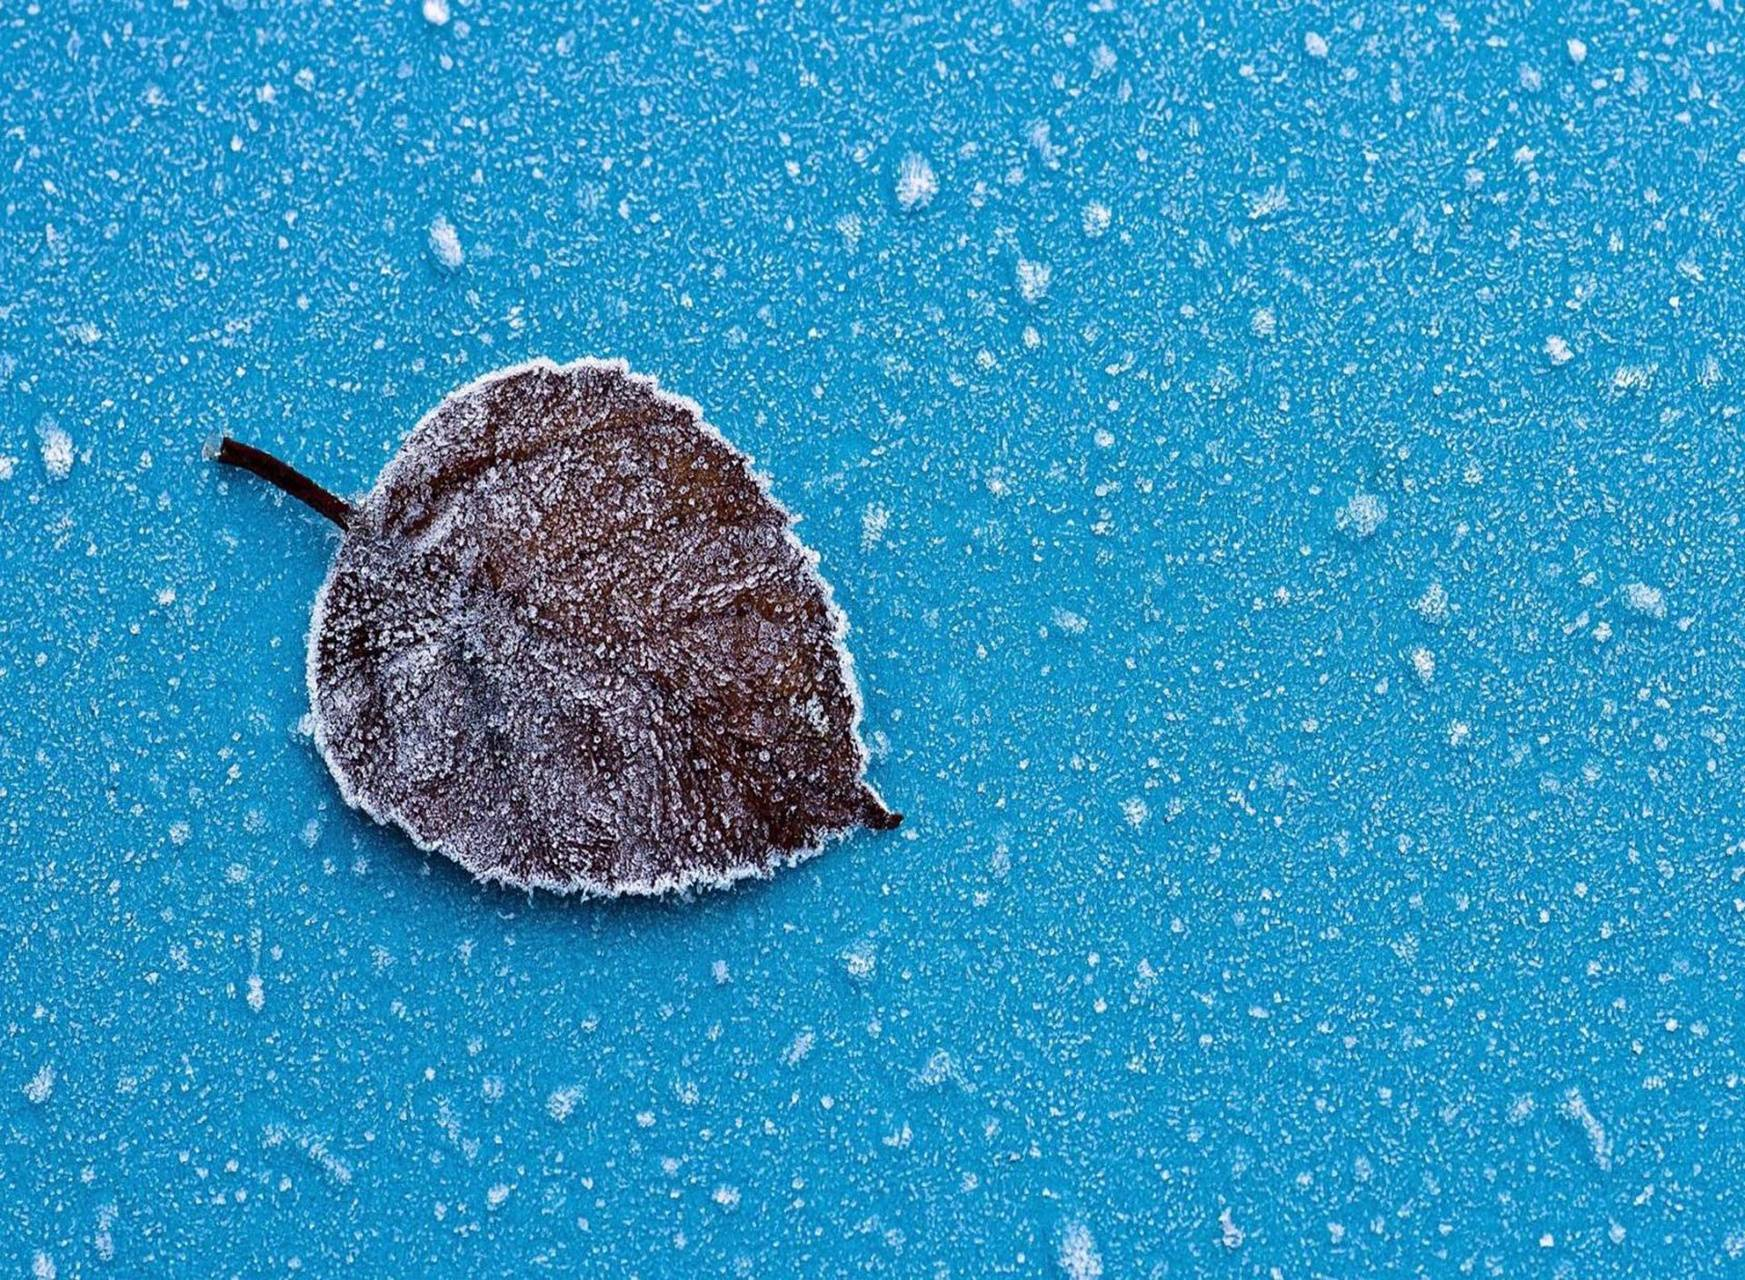 Lonely snowy leaf